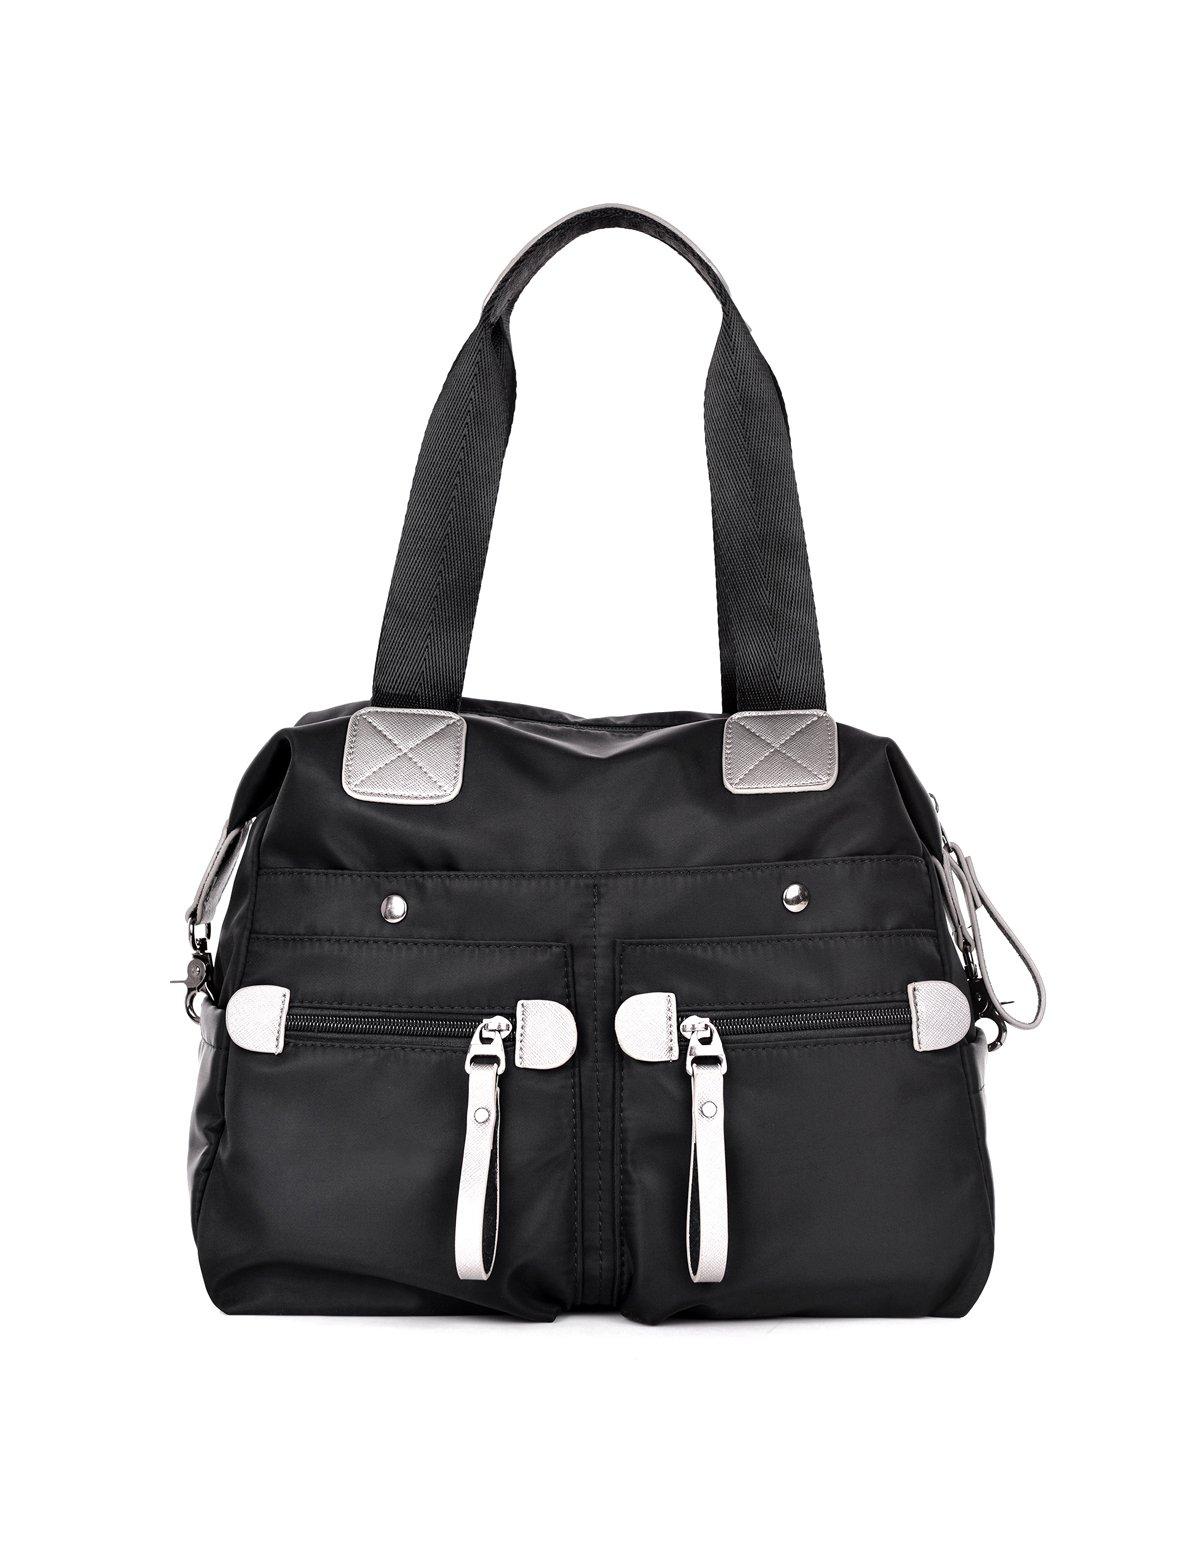 DOURR Women's Messenger Bag Tote Bag Shoulder Bag Oxford Nylon Waterproof Crossbody Bags (black)